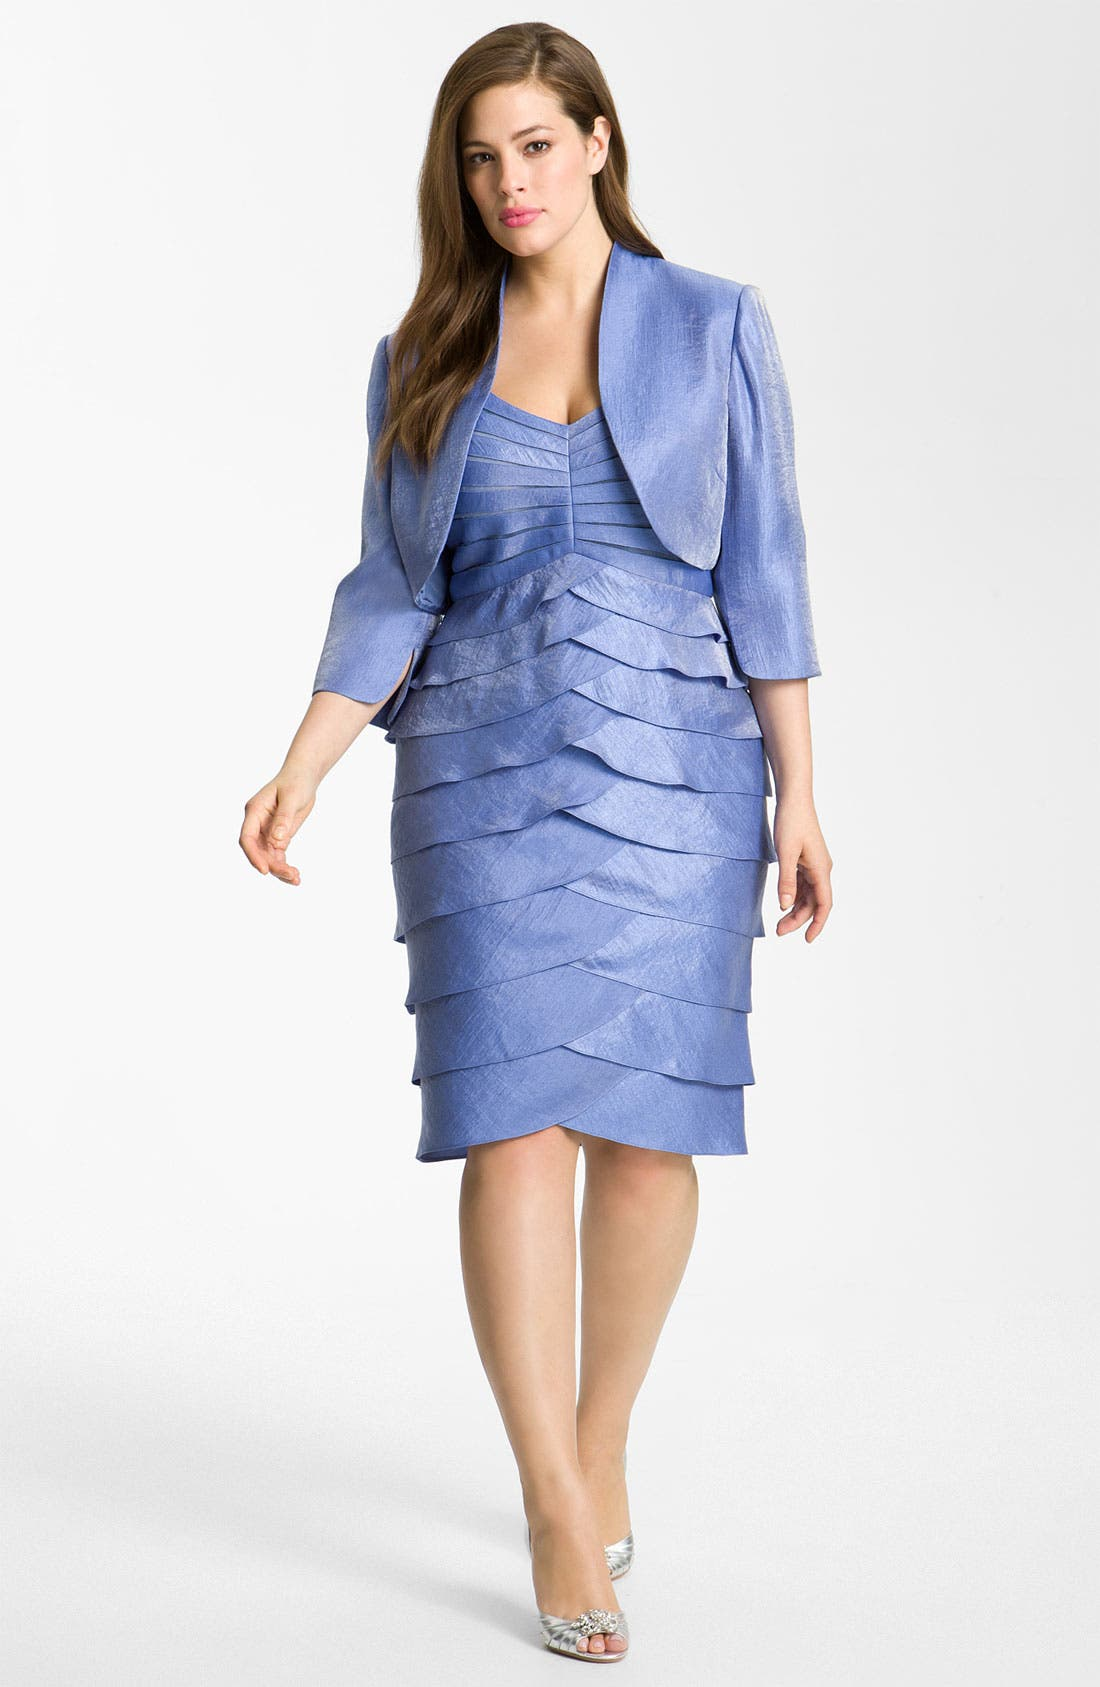 Alternate Image 1 Selected - Adrianna Papell Evening Shutter Pleat Dress with Bolero Jacket (Plus)